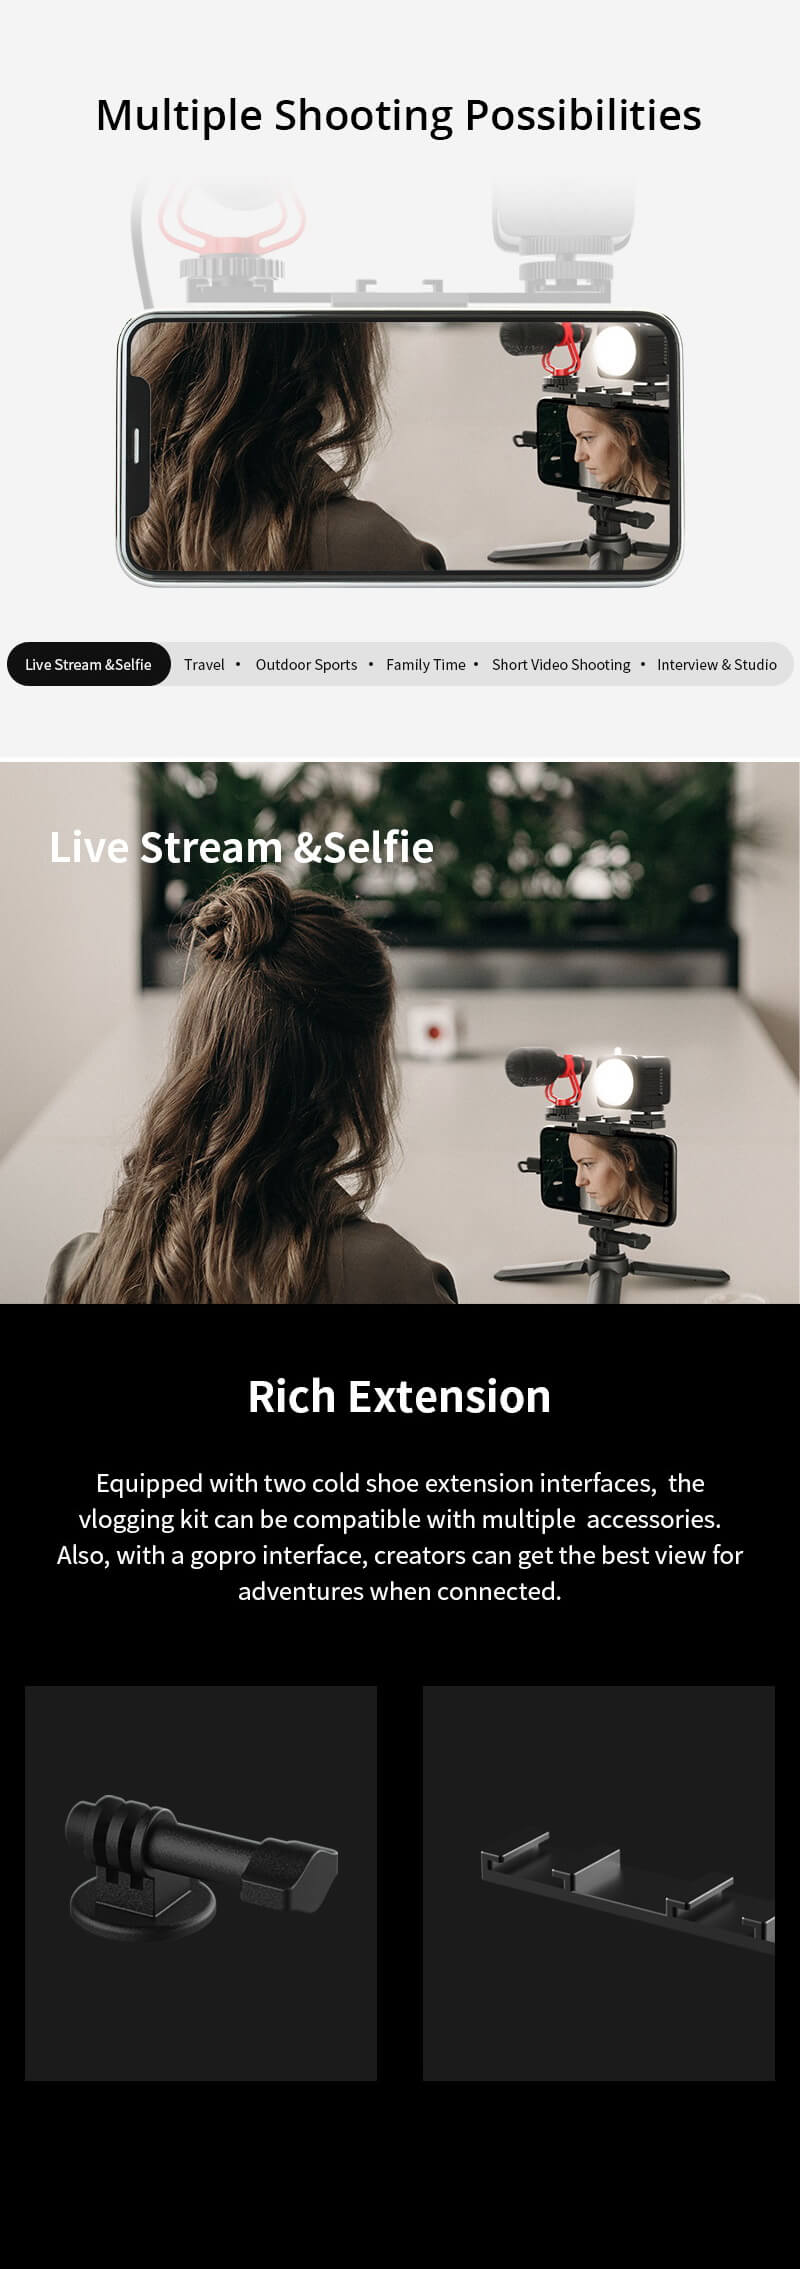 MOZA Mirfak Vlogging Kit Set ชุดอุปกรณ์ถ่ายวีดีโอ ไลฟ์สด Live Vlog Youtuber 9